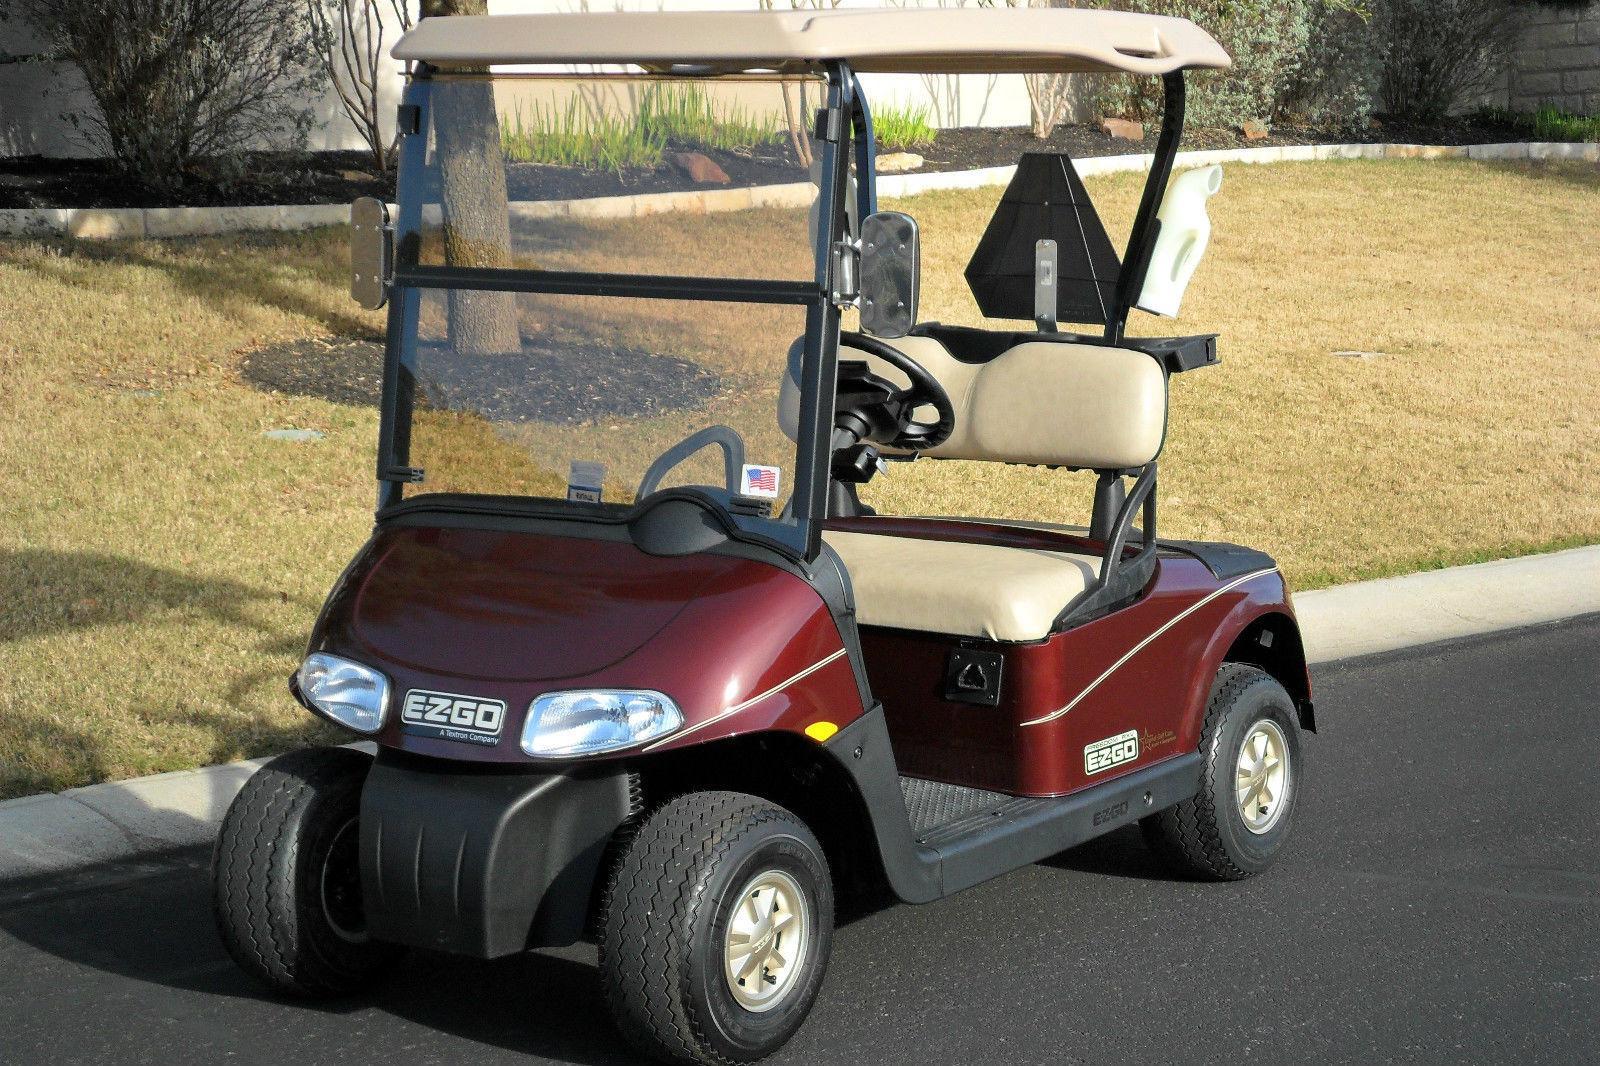 Electric Car Go - Best Secret Wiring Diagram • on ez go golf cart 36 volt wiring diagram, yamaha golf cart parts diagram, ezgo 36 volt diagram,